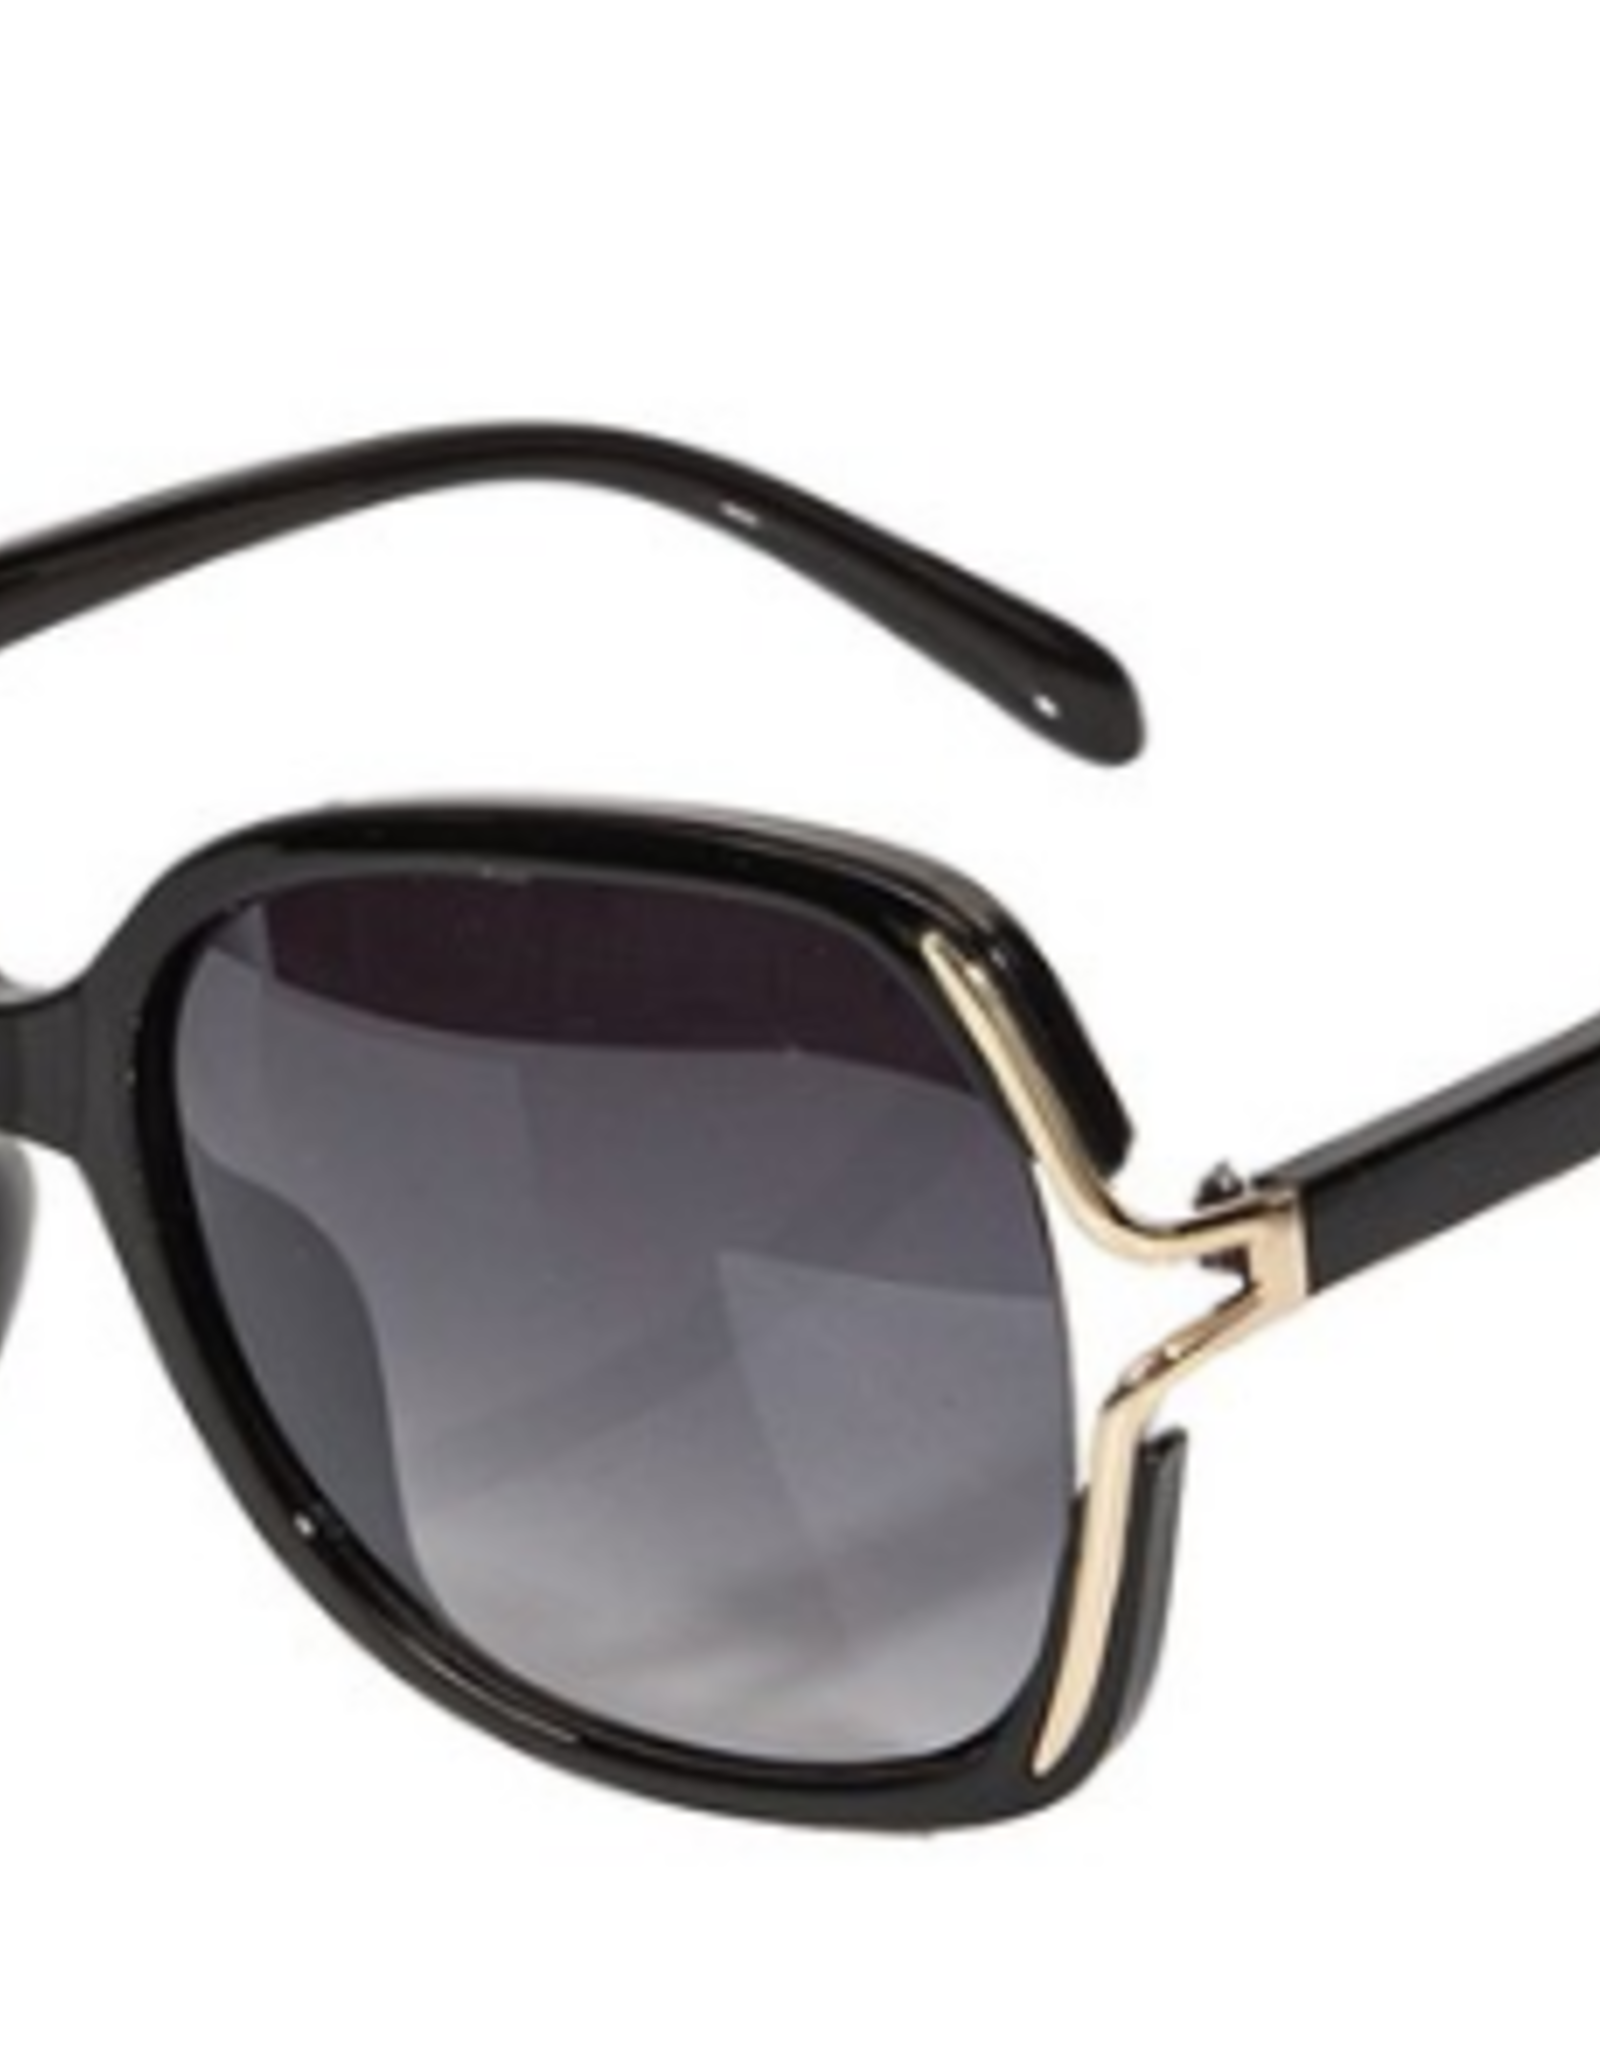 Wink Celine Sunglasses